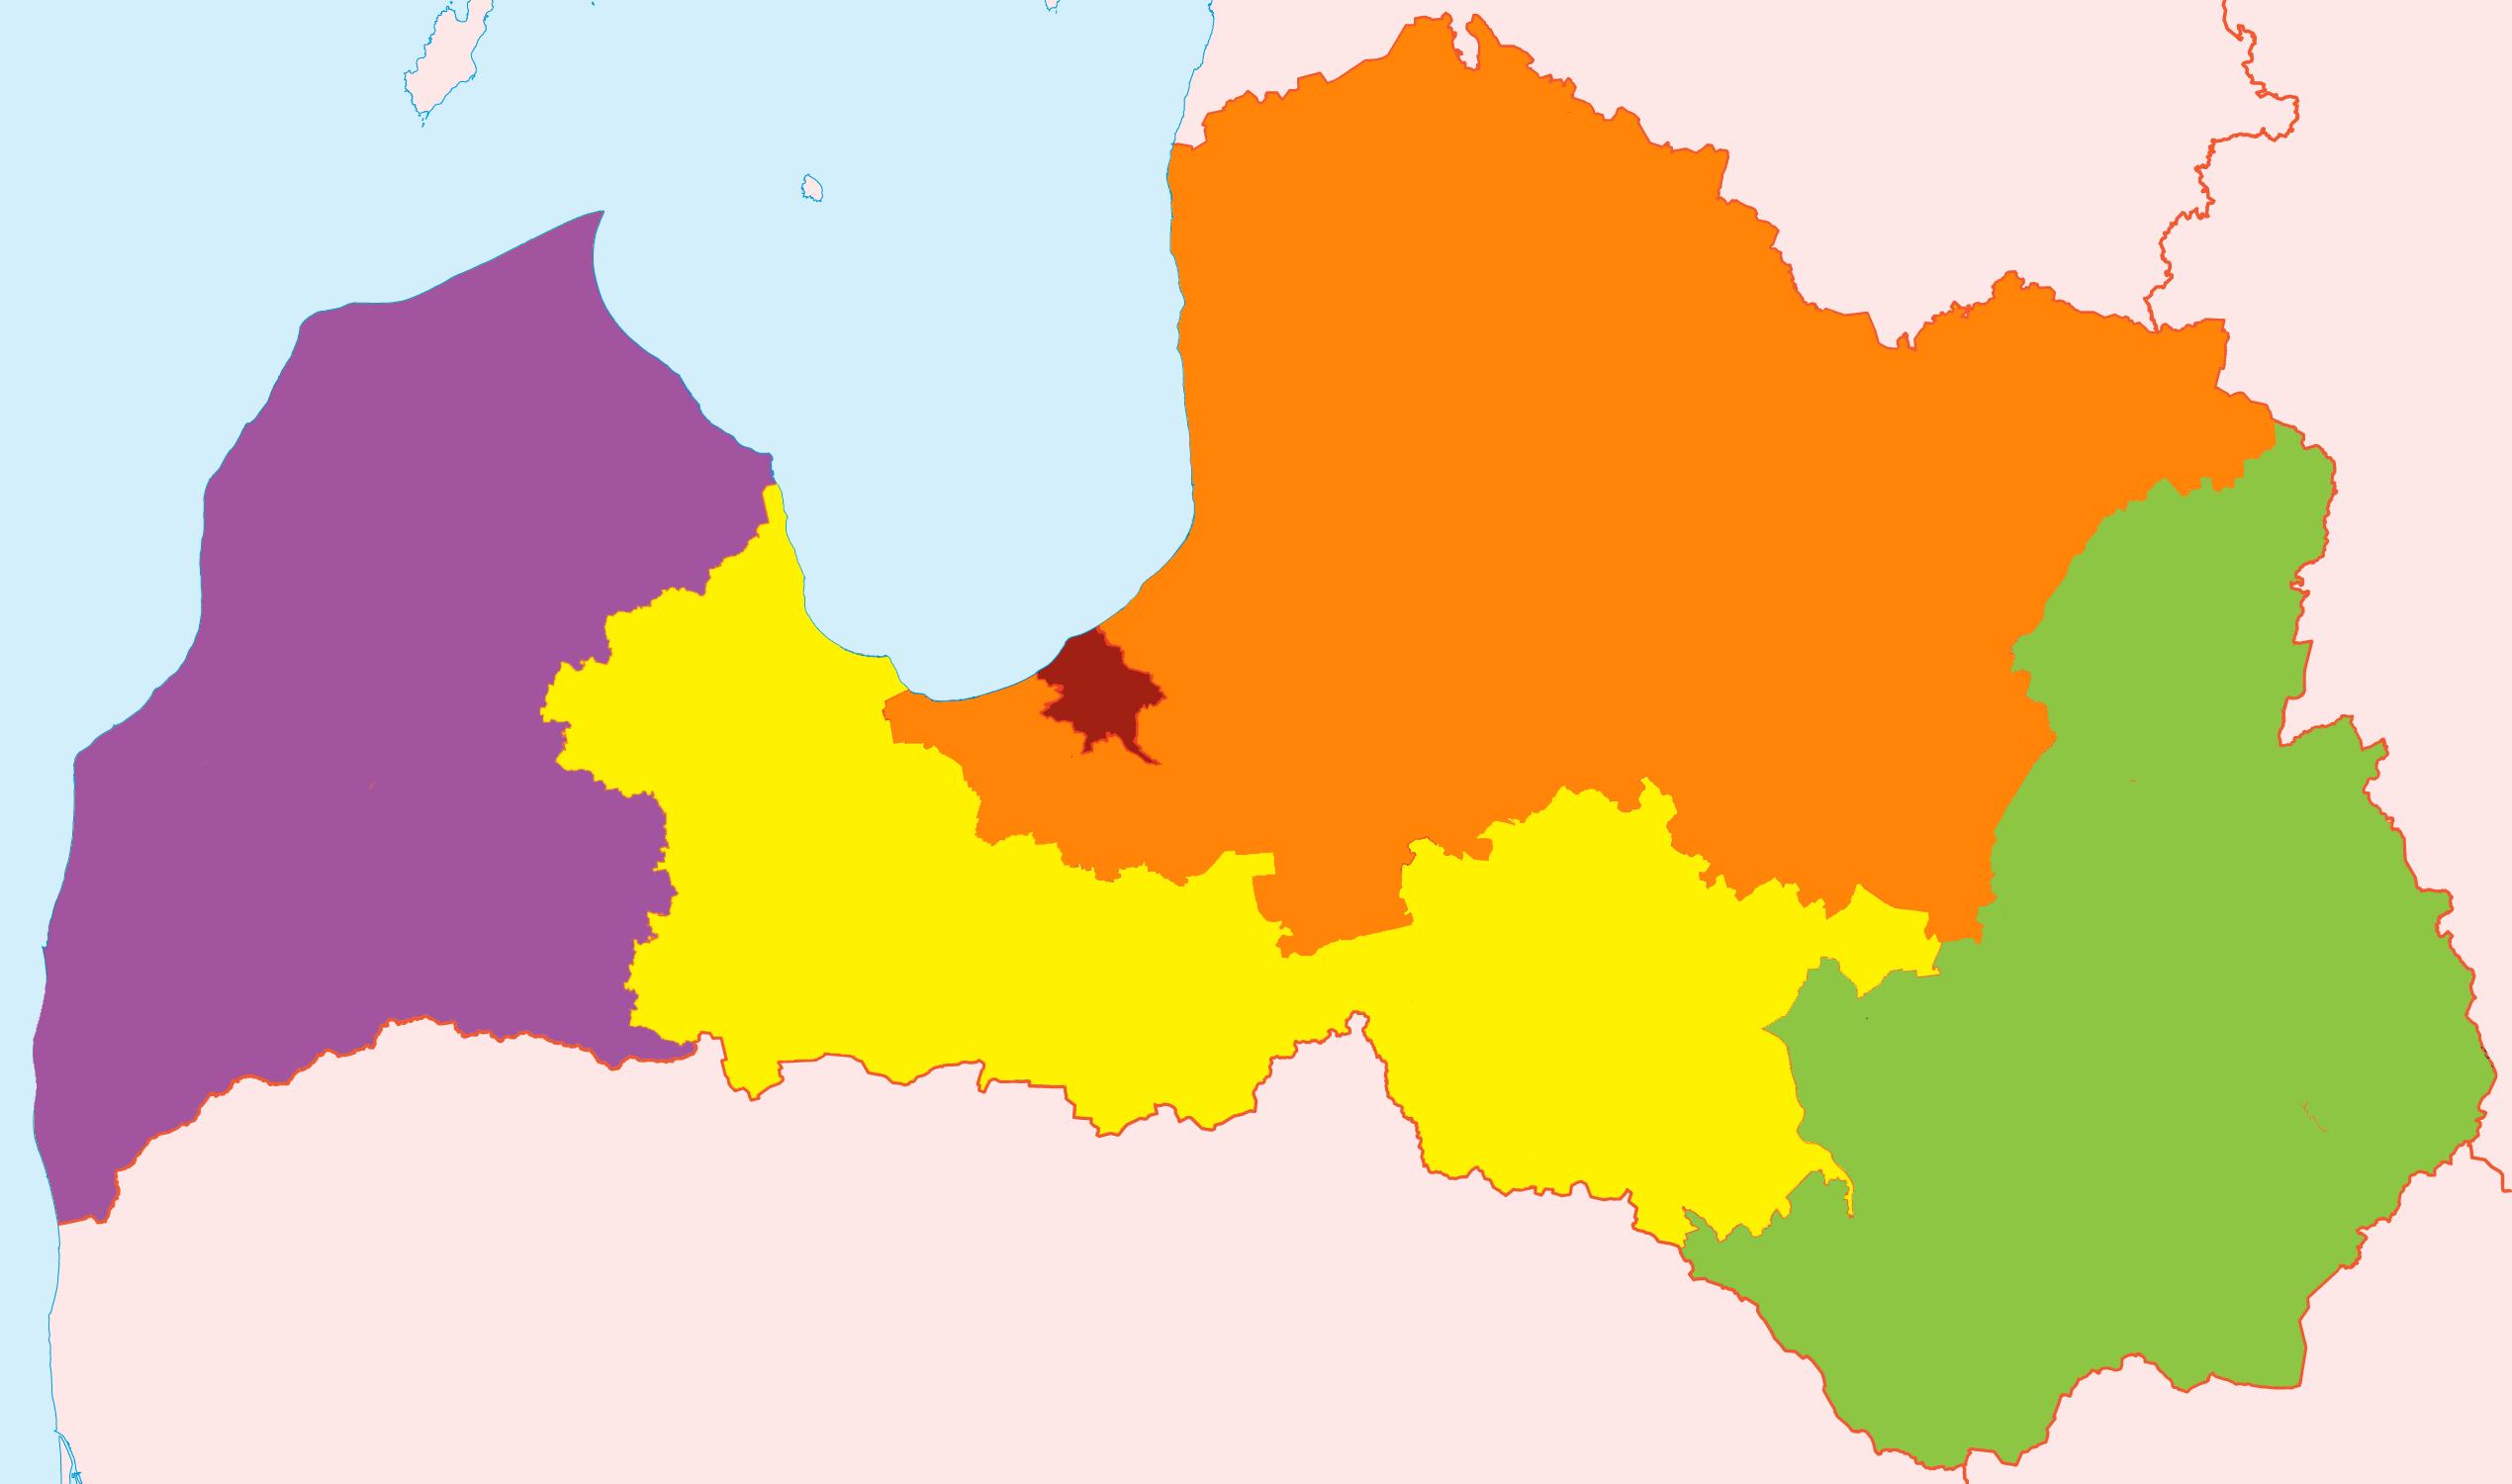 Filelatvia elctoral districts blankg wikimedia commons filelatvia elctoral districts blankg publicscrutiny Gallery